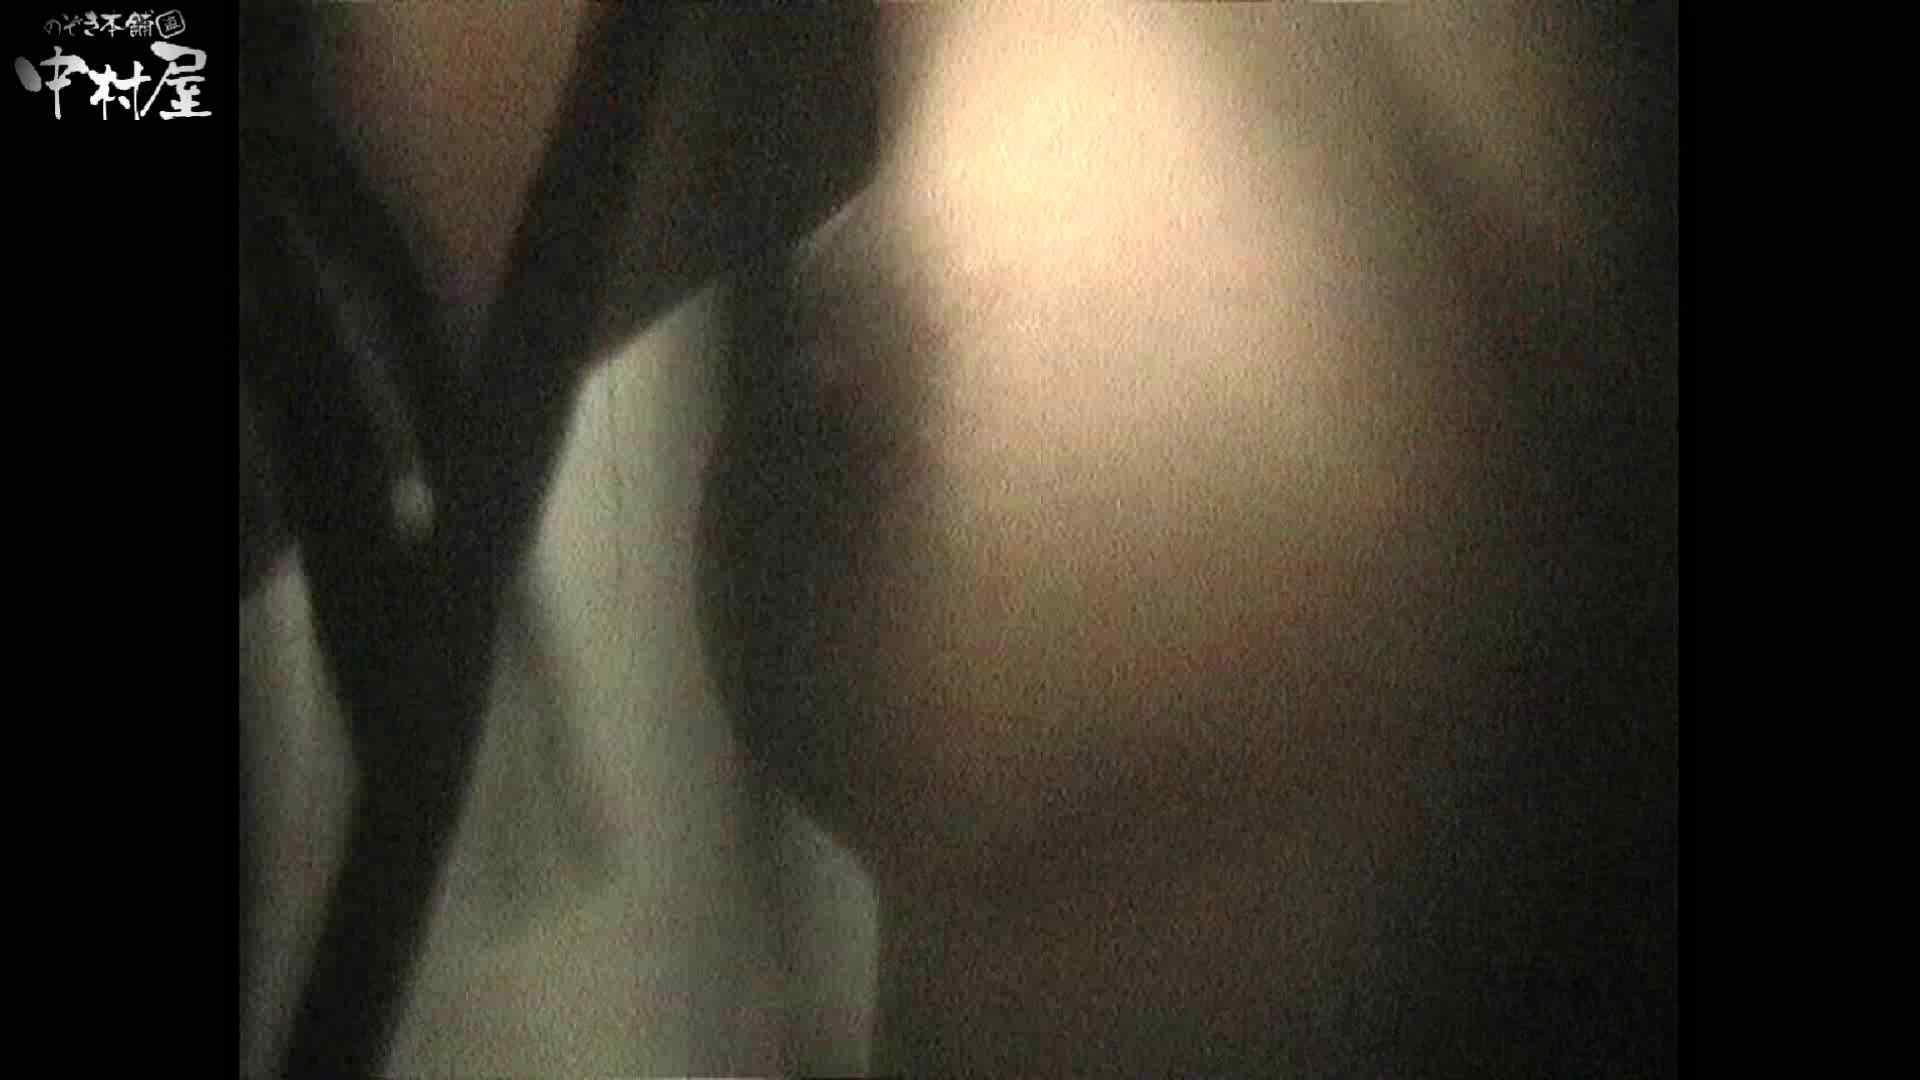 No.16 アニマル柄の水着 レースのパンツにナプキンを装着する金髪お姉さん 接写 セックス無修正動画無料 67連発 2